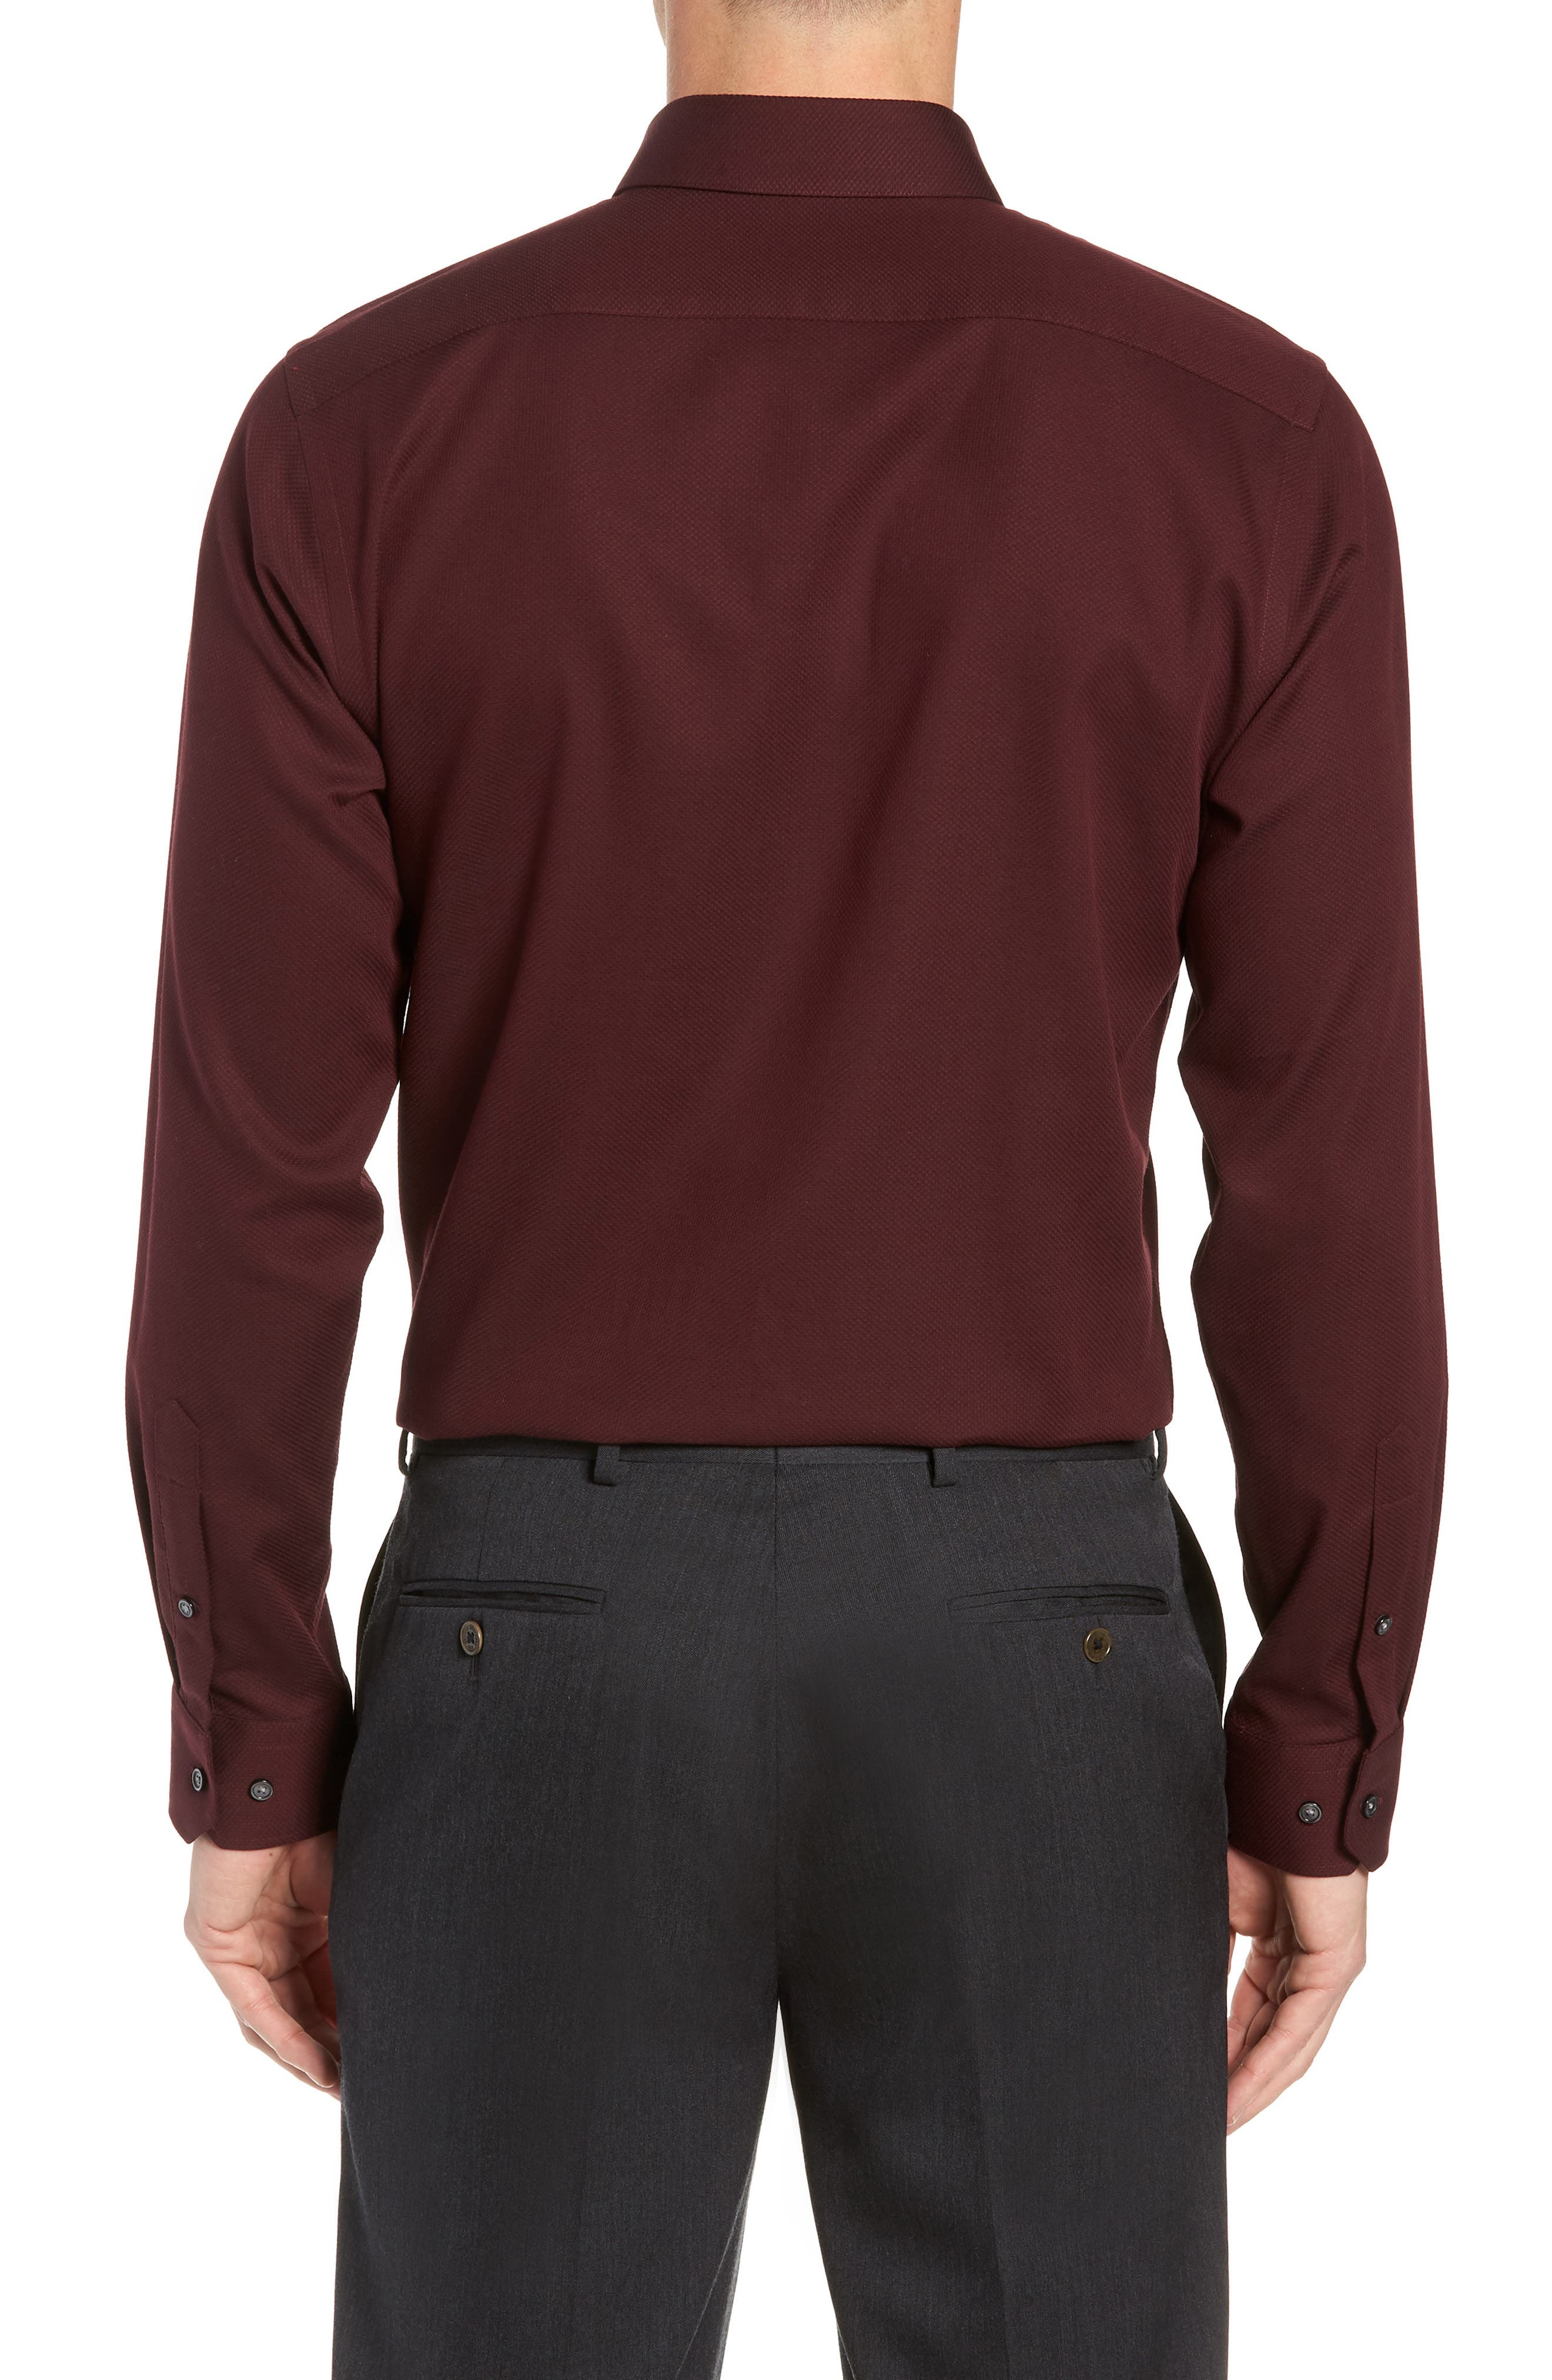 Trim Fit Non-Iron Solid Dress Shirt,                             Alternate thumbnail 3, color,                             BURGUNDY ROYALE